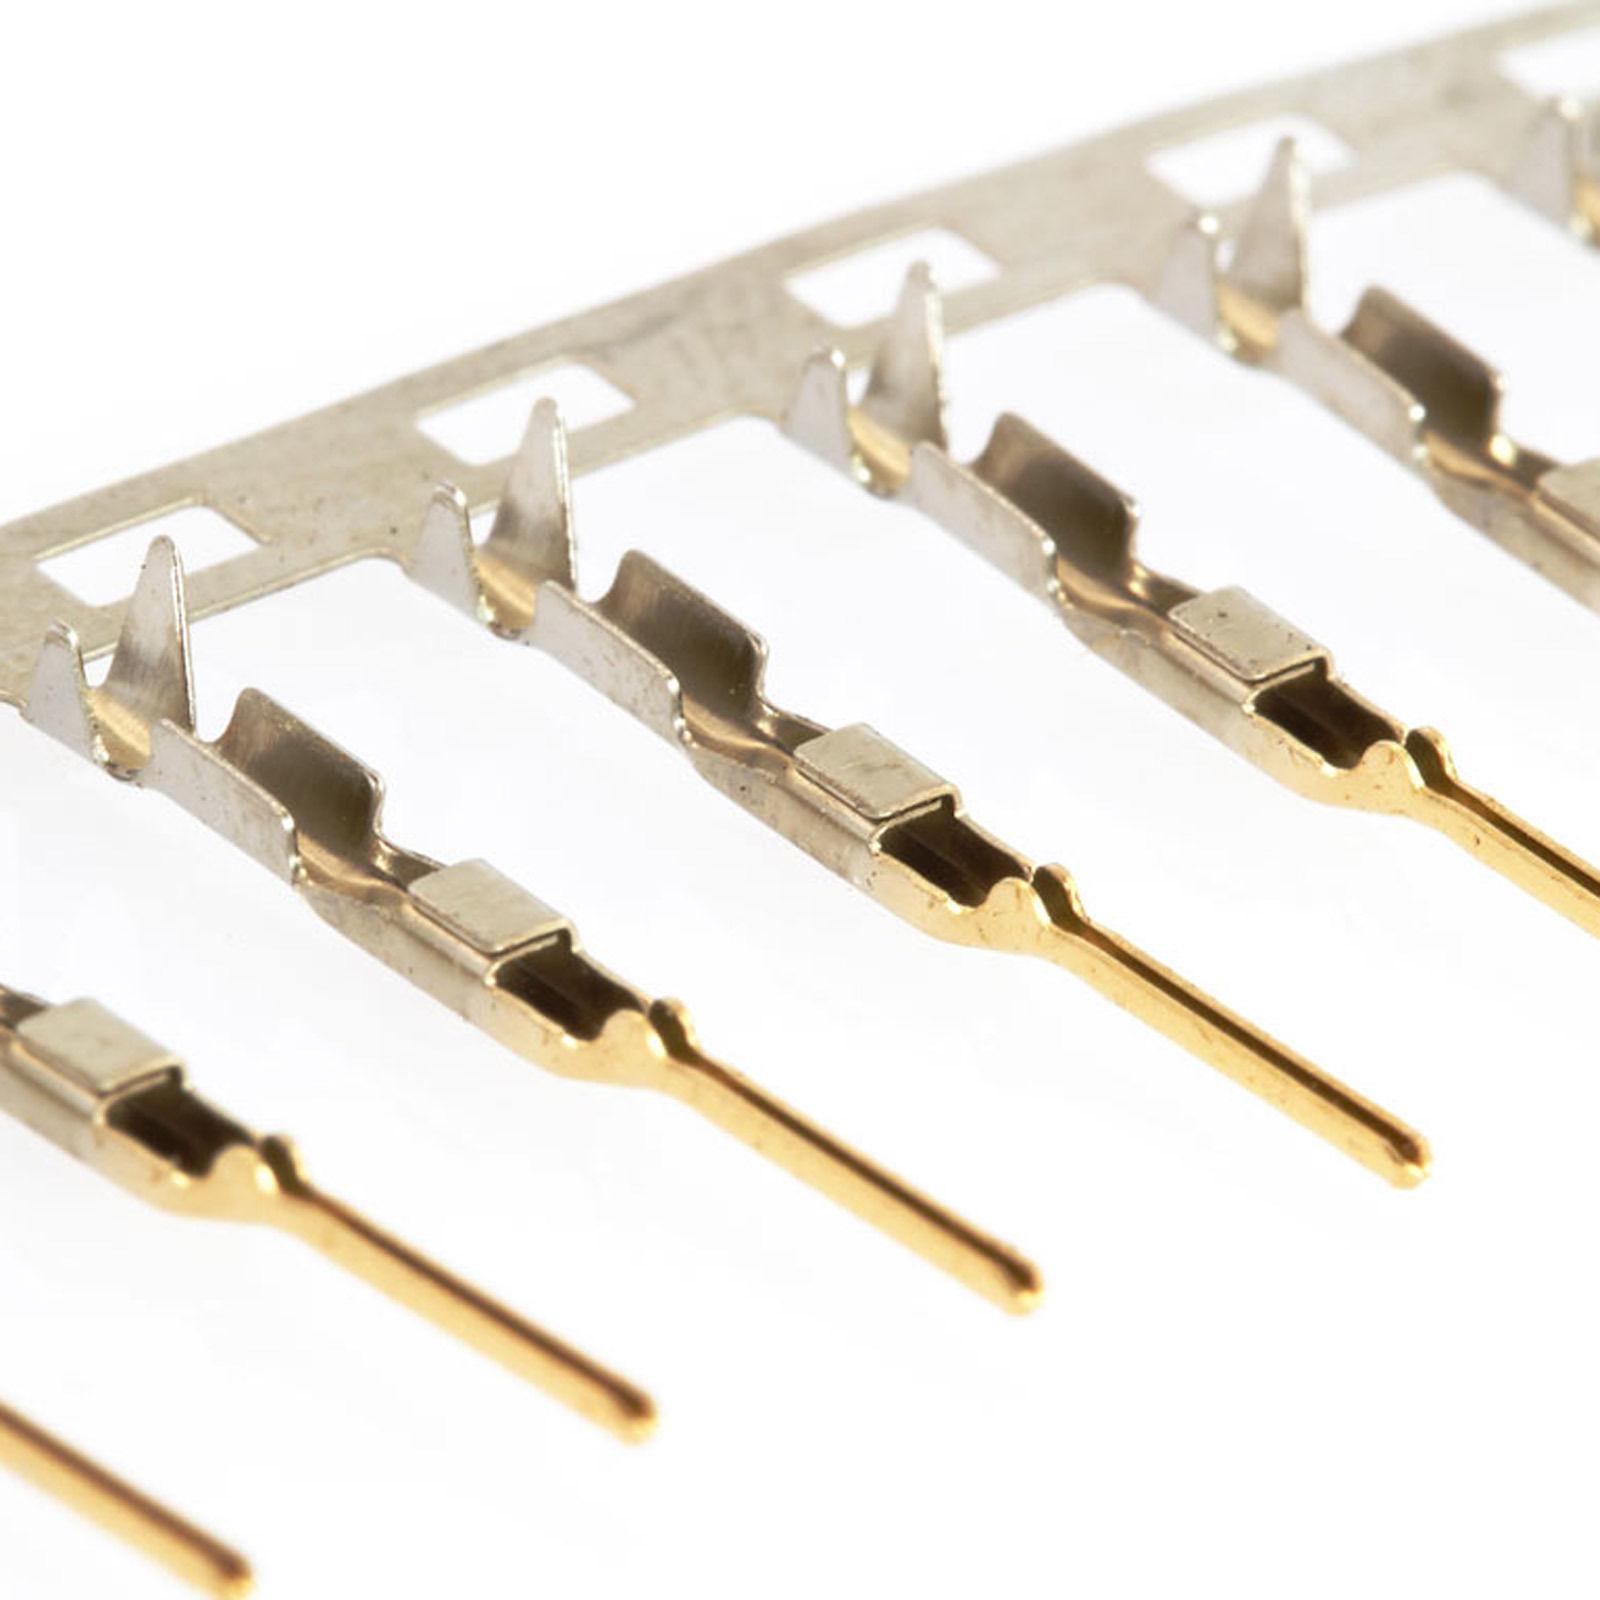 Male Crimp Pins